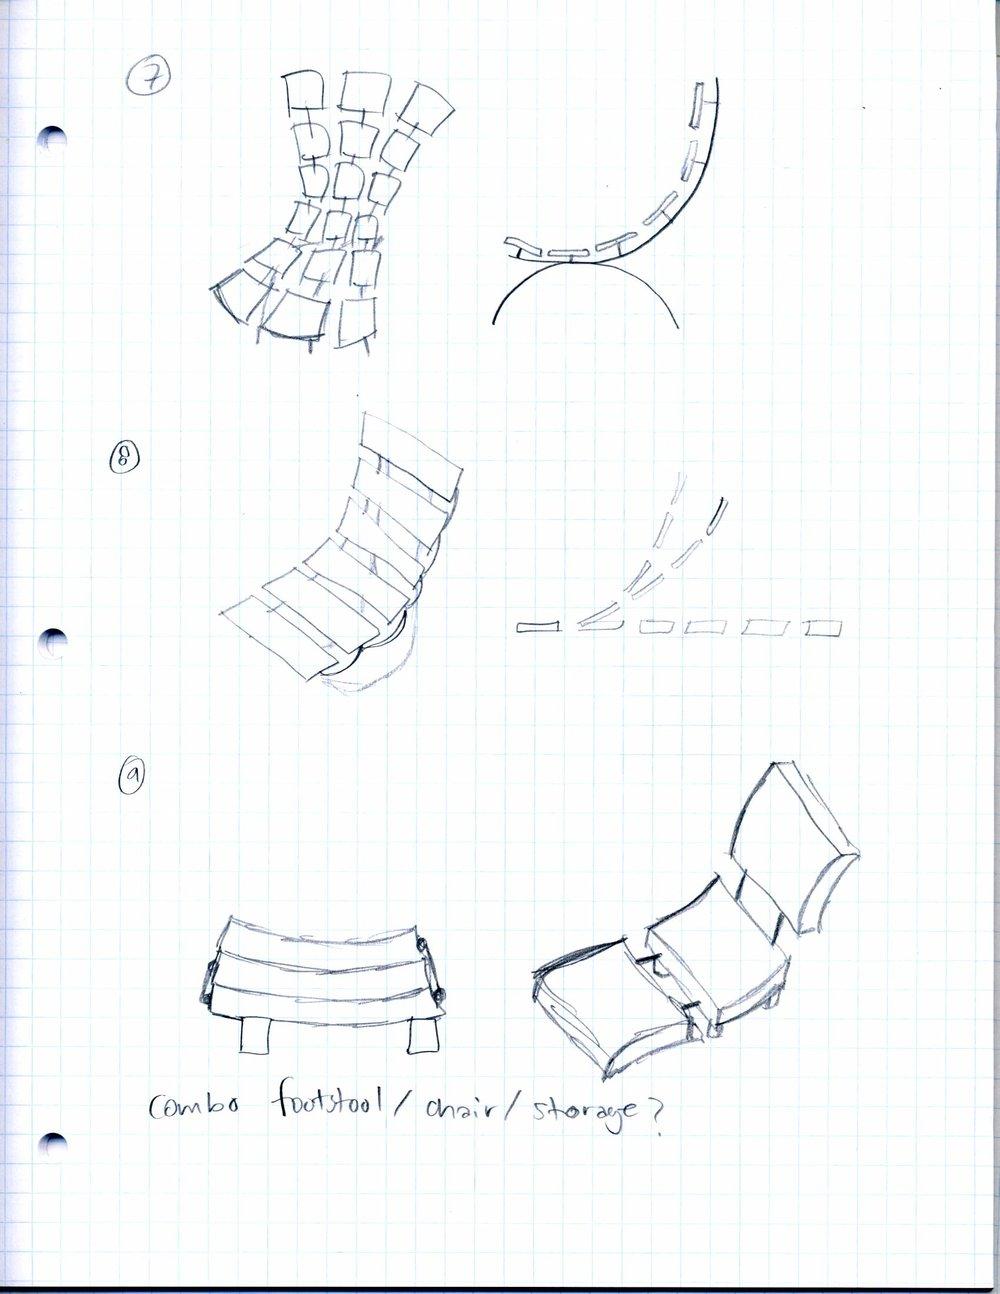 chair sketch 3.jpg